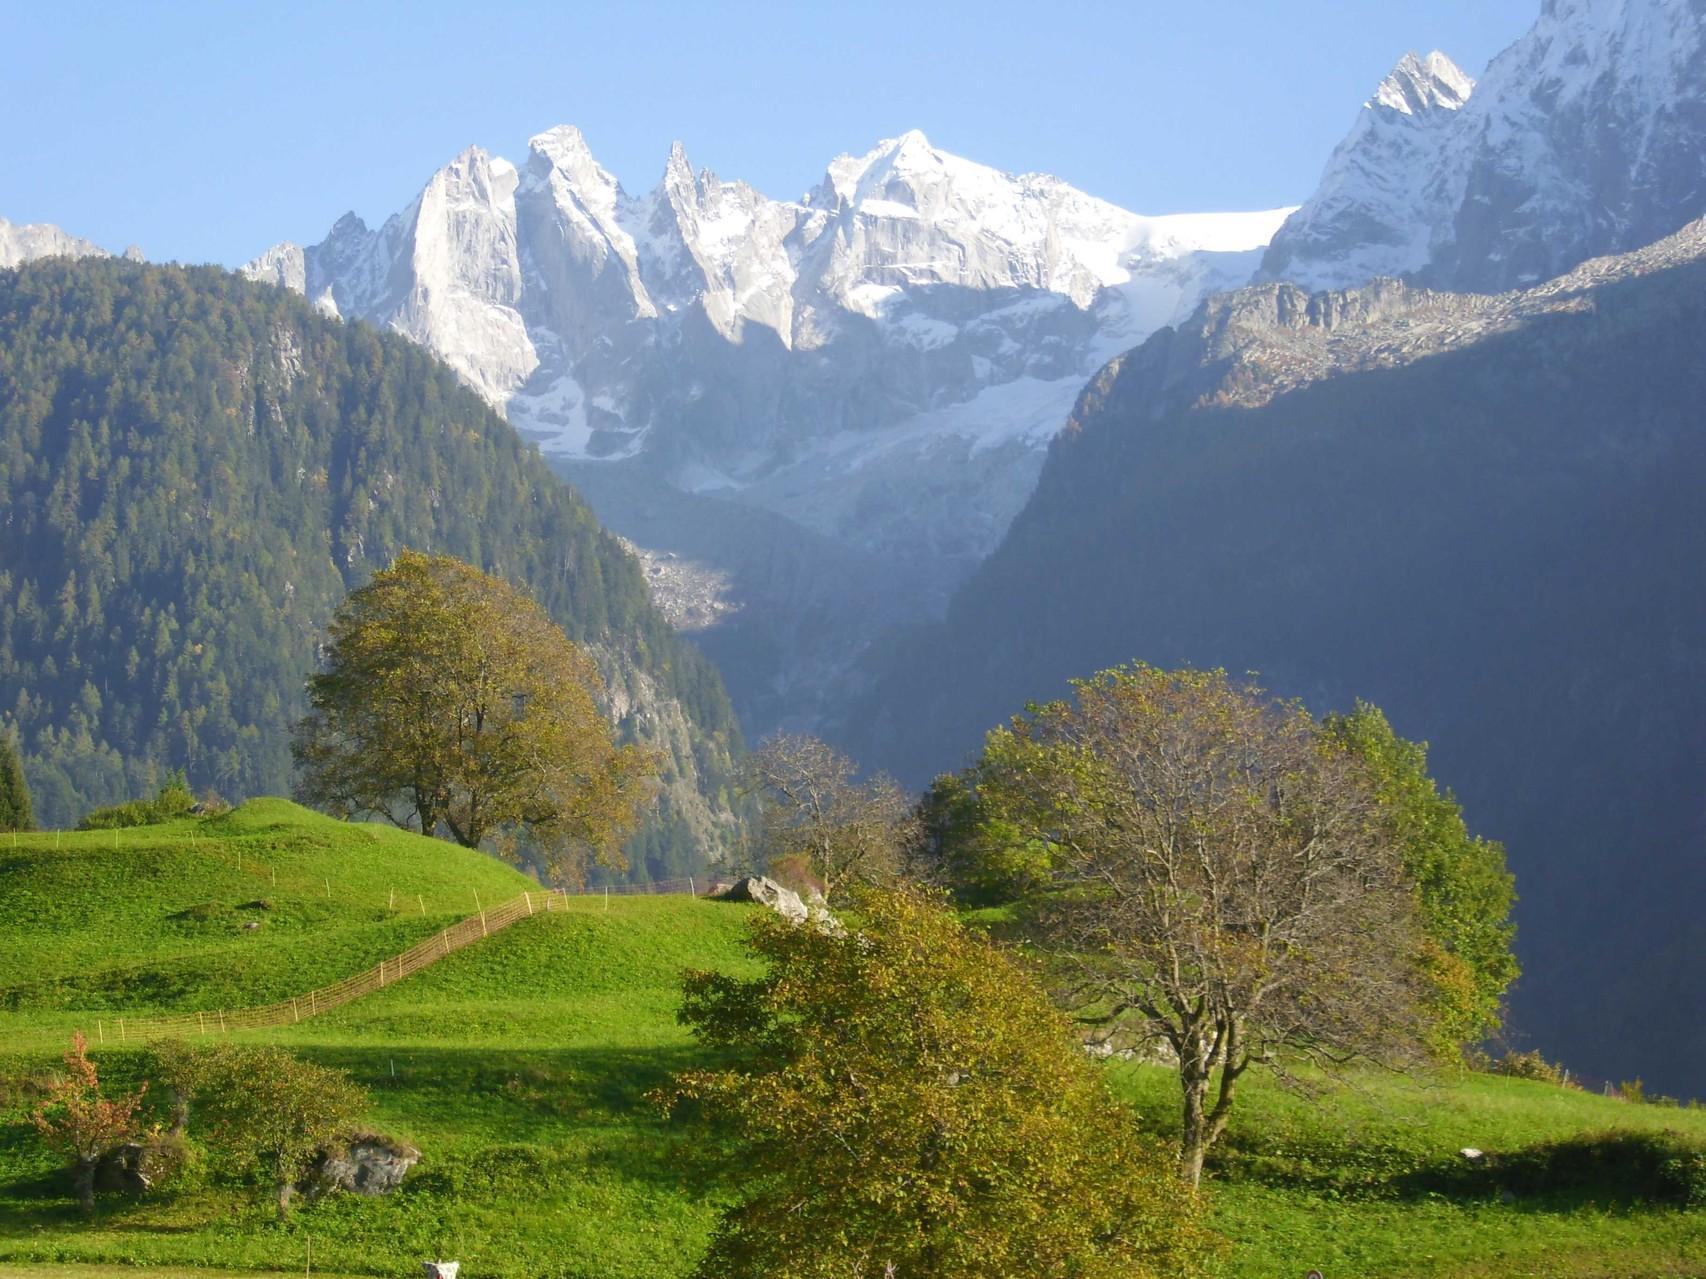 Blick auf die Sciora-Berge